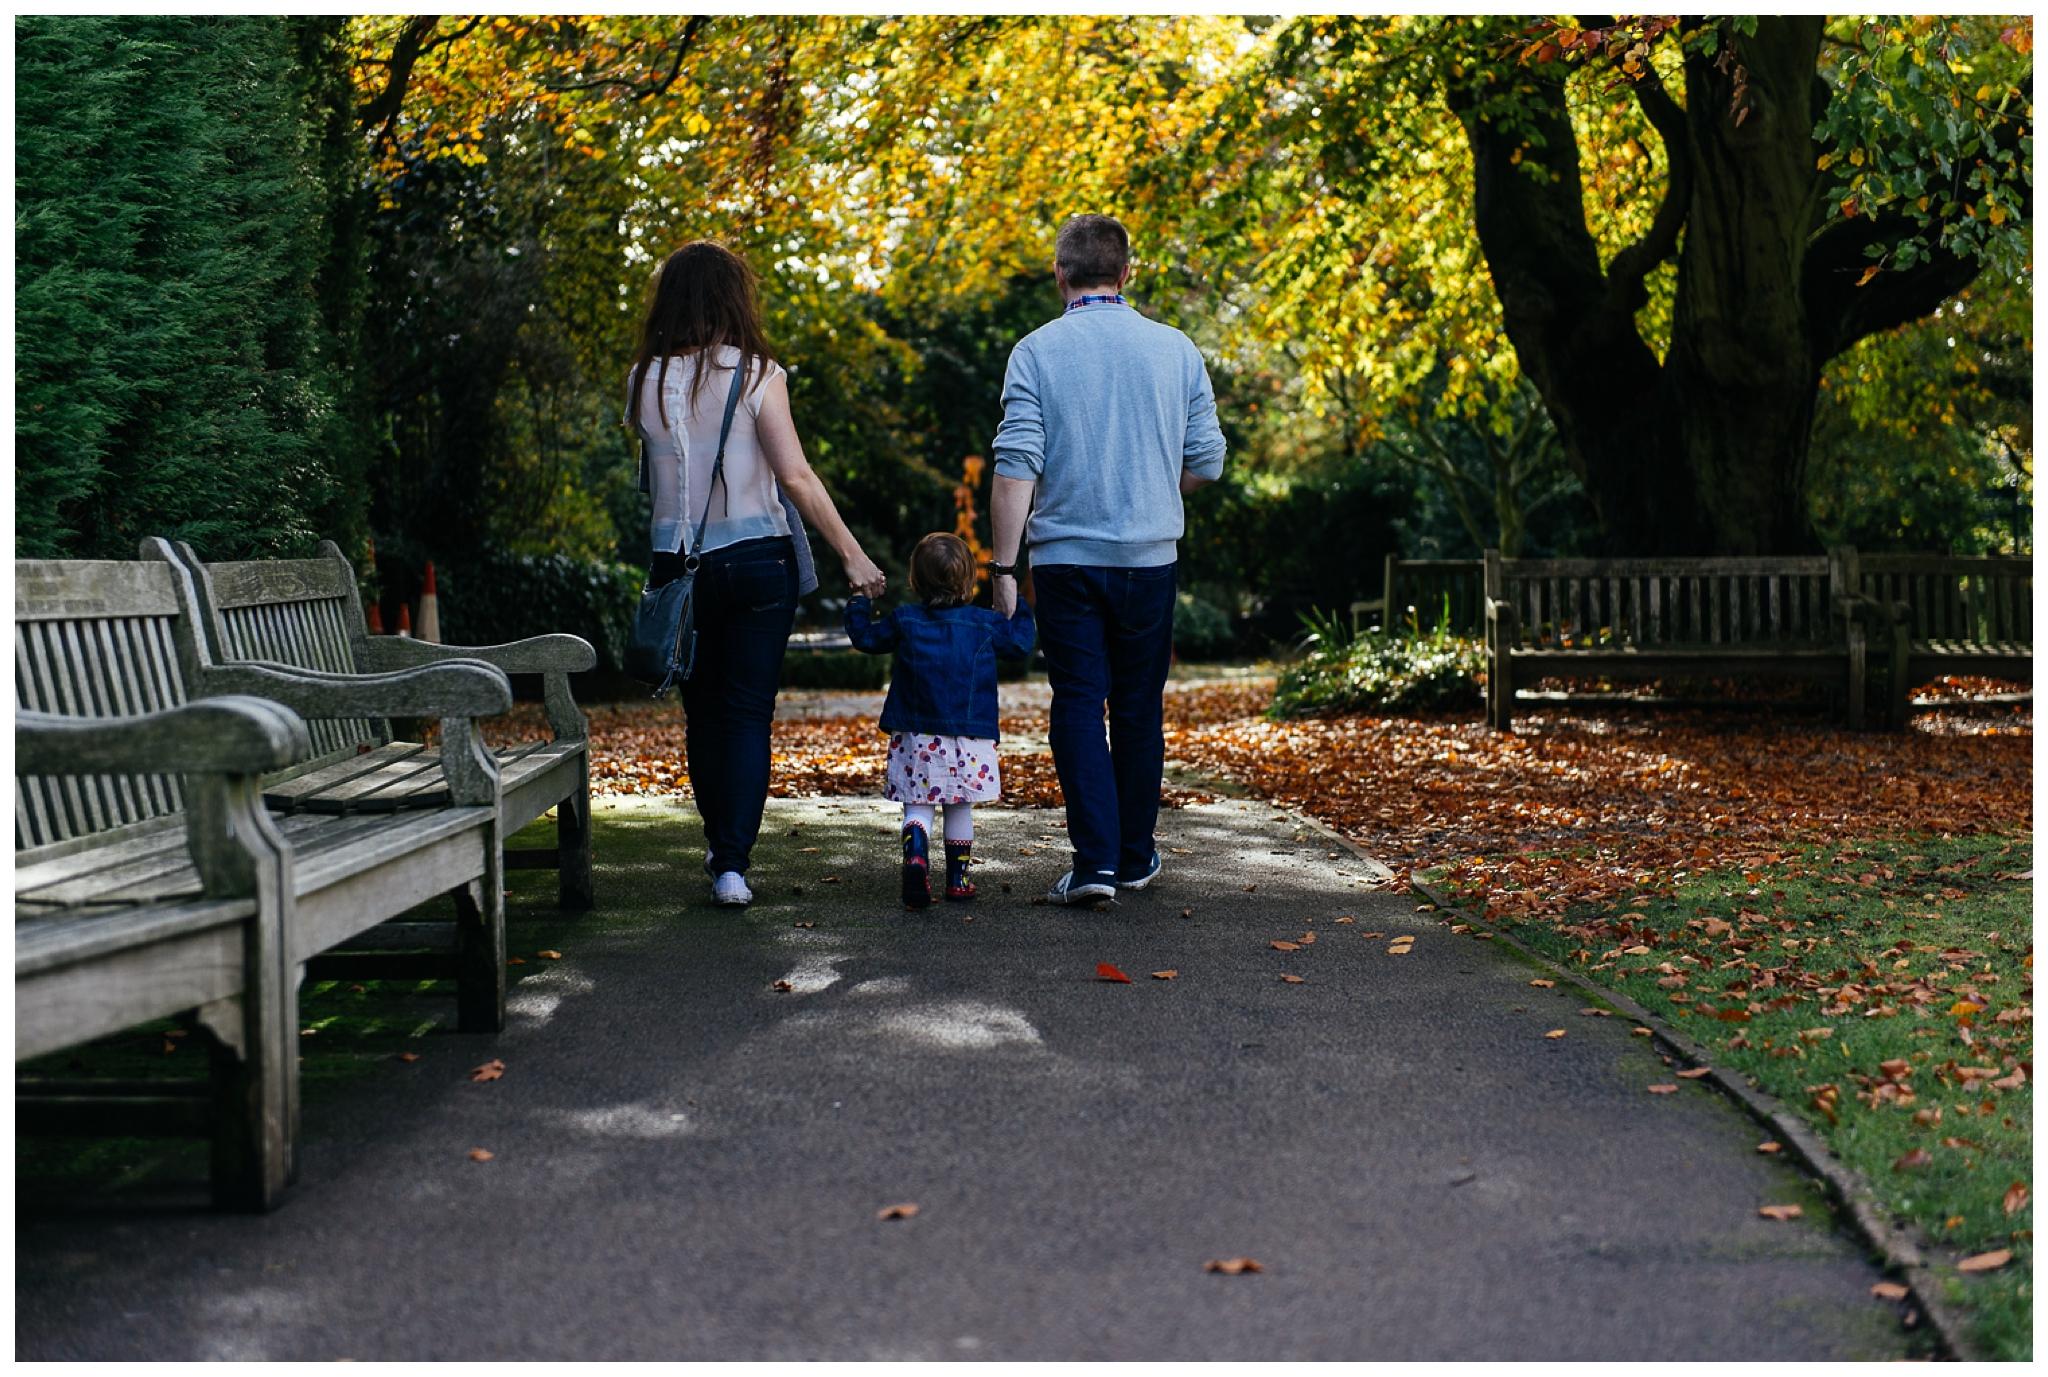 Autumn-family-portraits-birmingham-photographer_0018.jpg